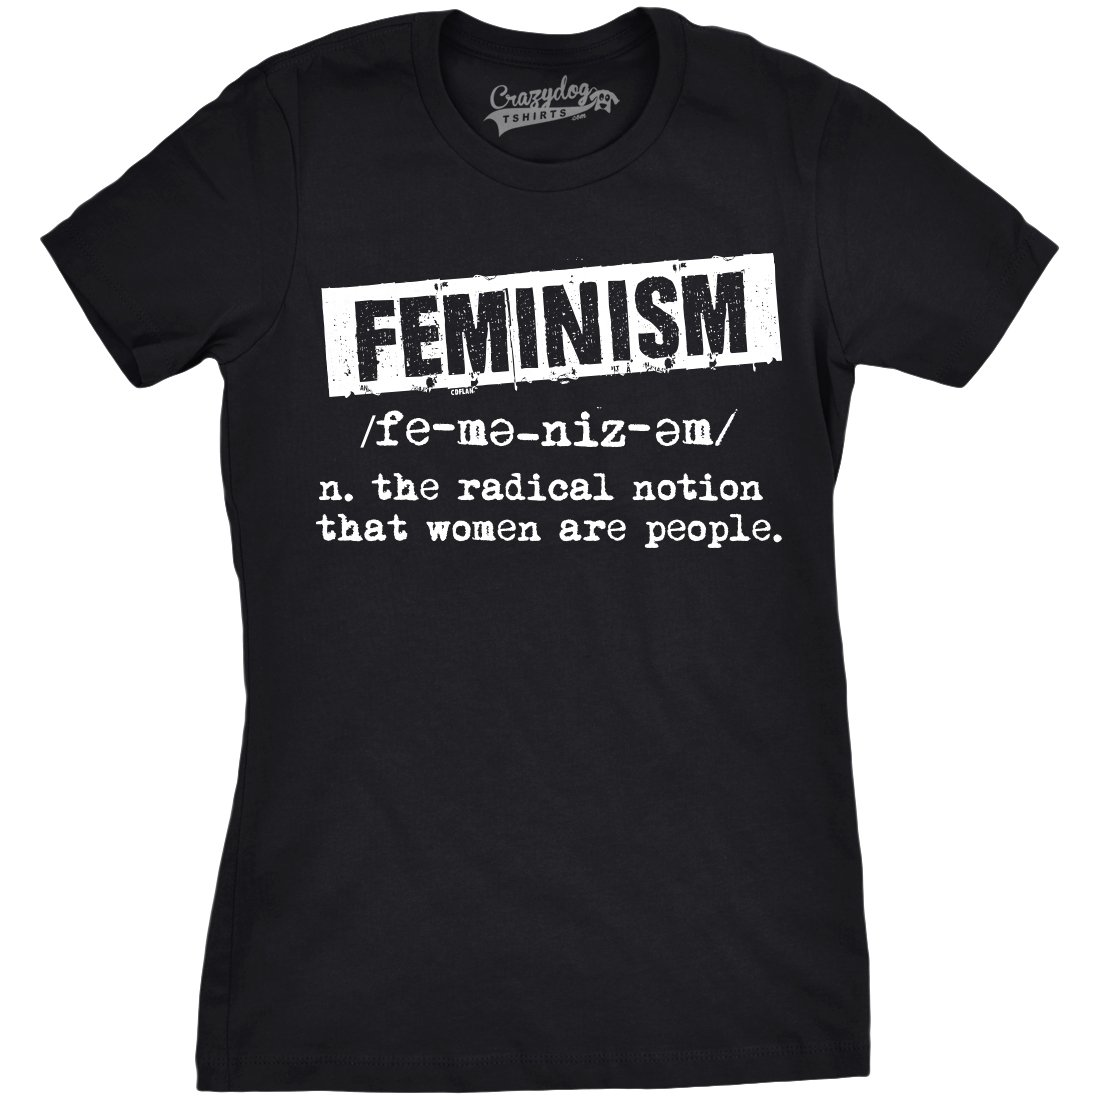 Feminist Definition Cool Empowert Tshirt For